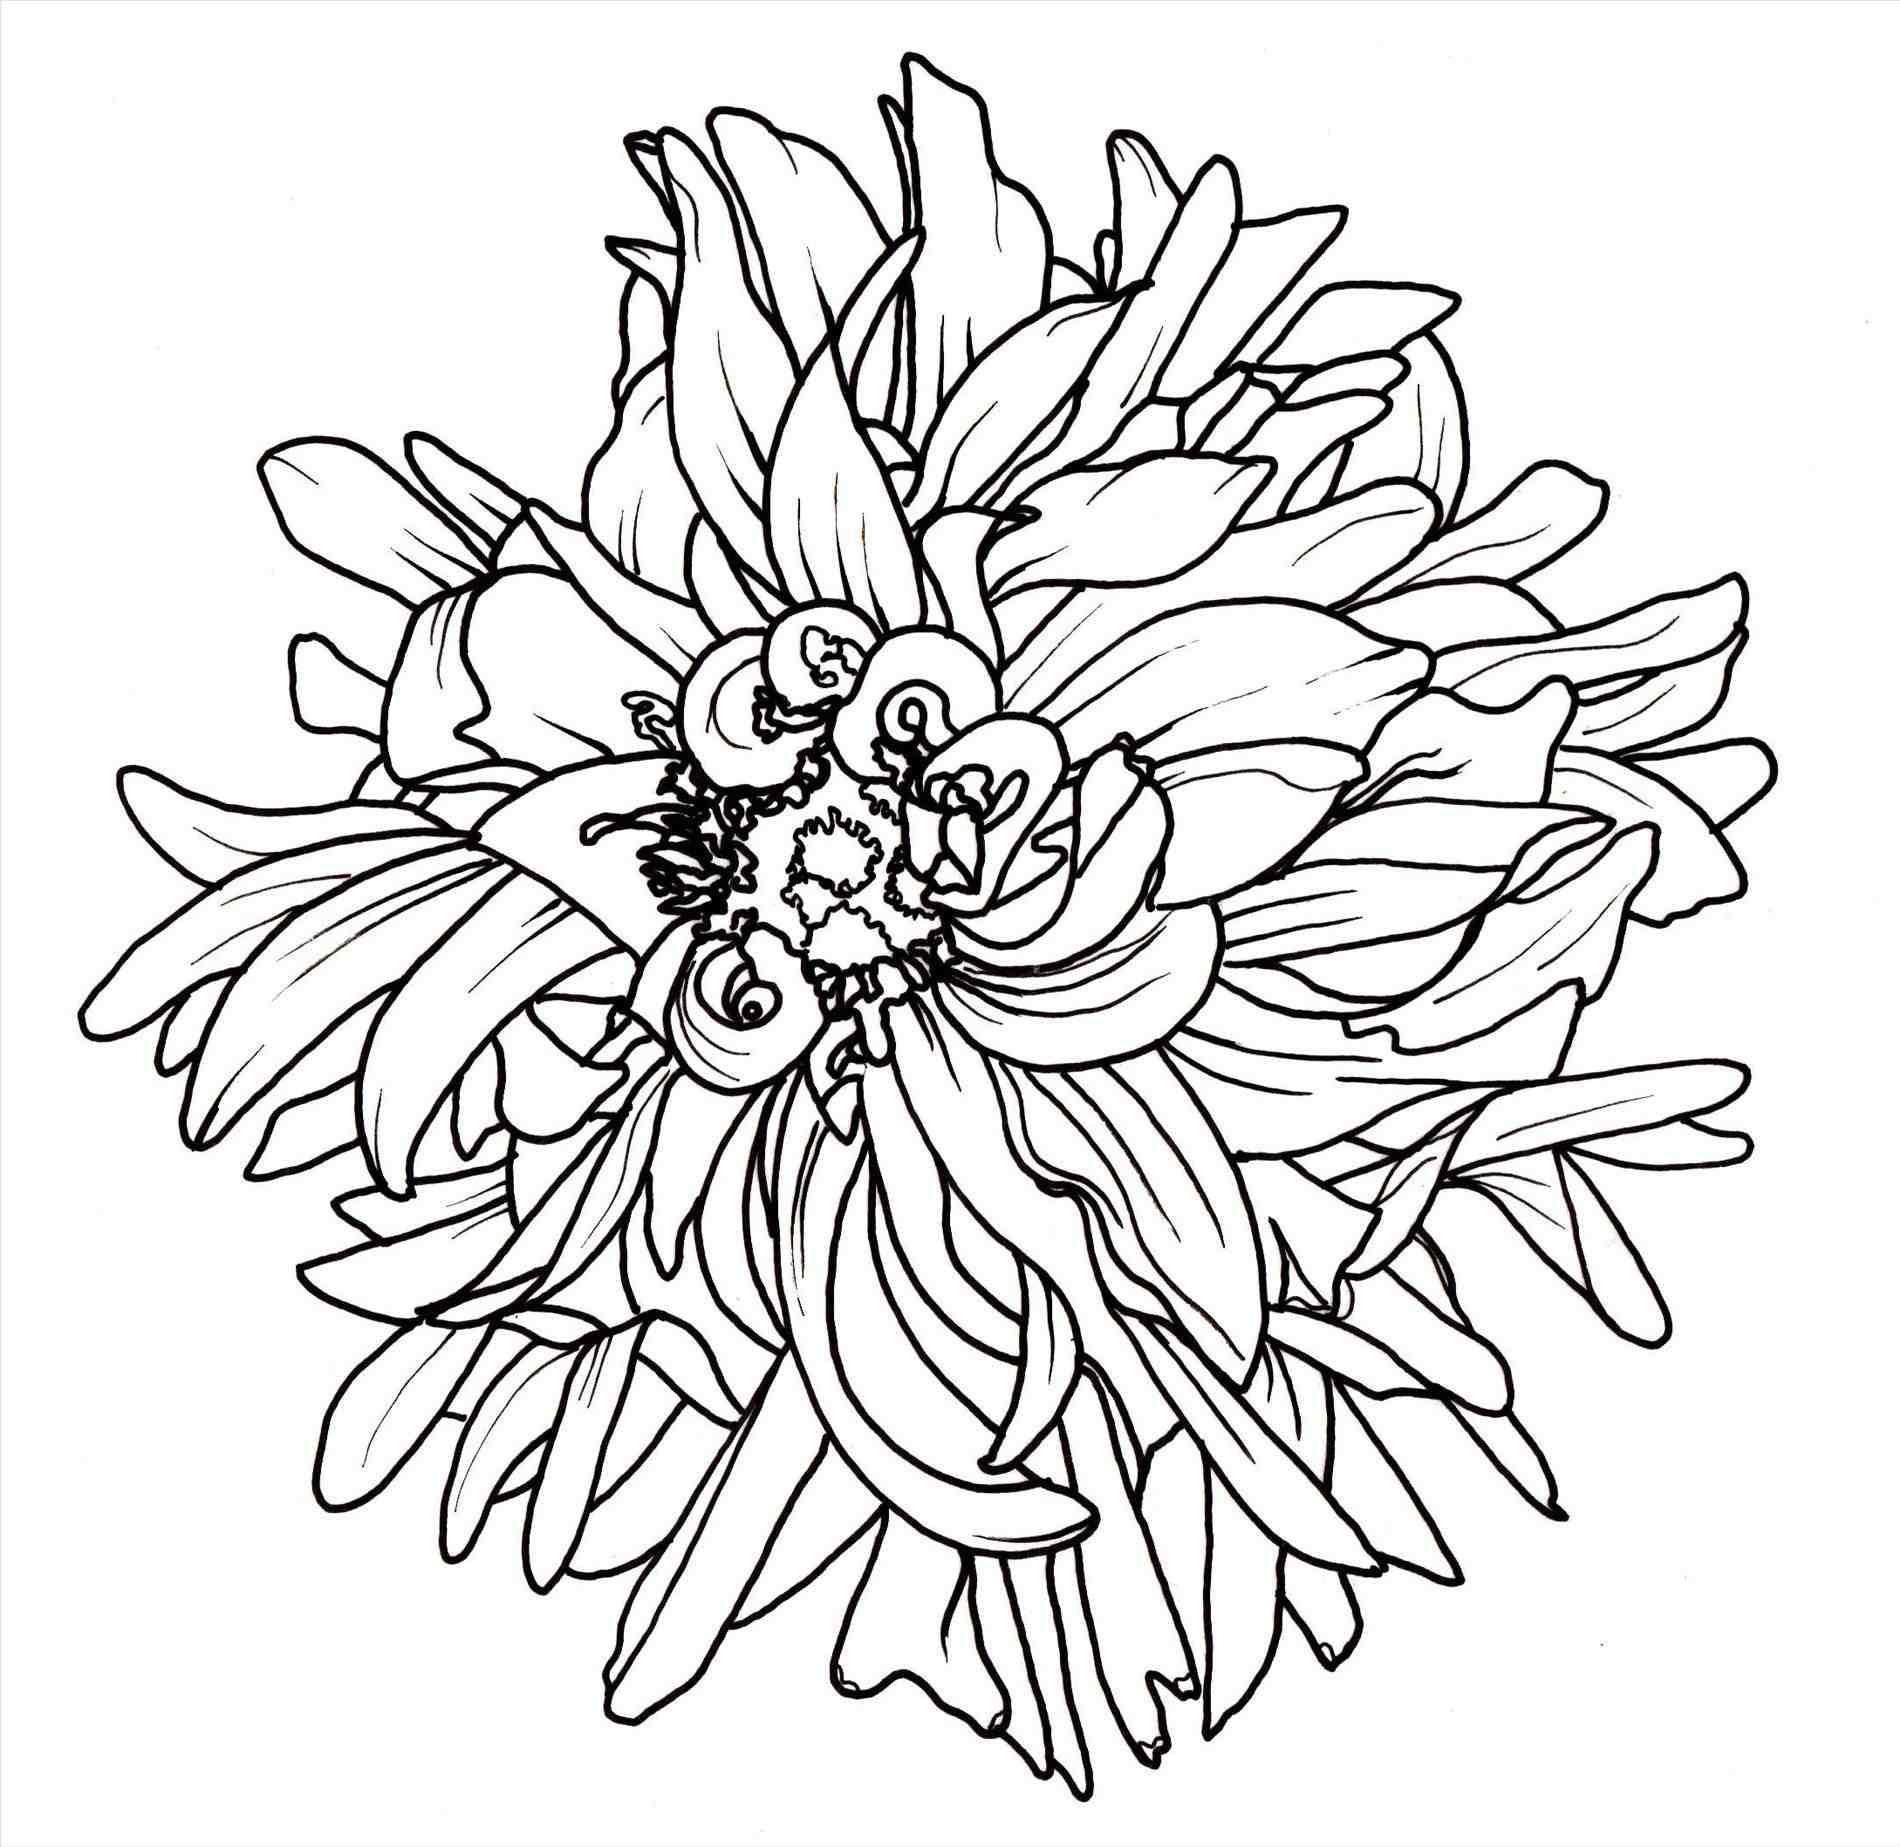 1900x1847 Flowers Drawing Easy For Kids Simple Rose Drawings In Pencil